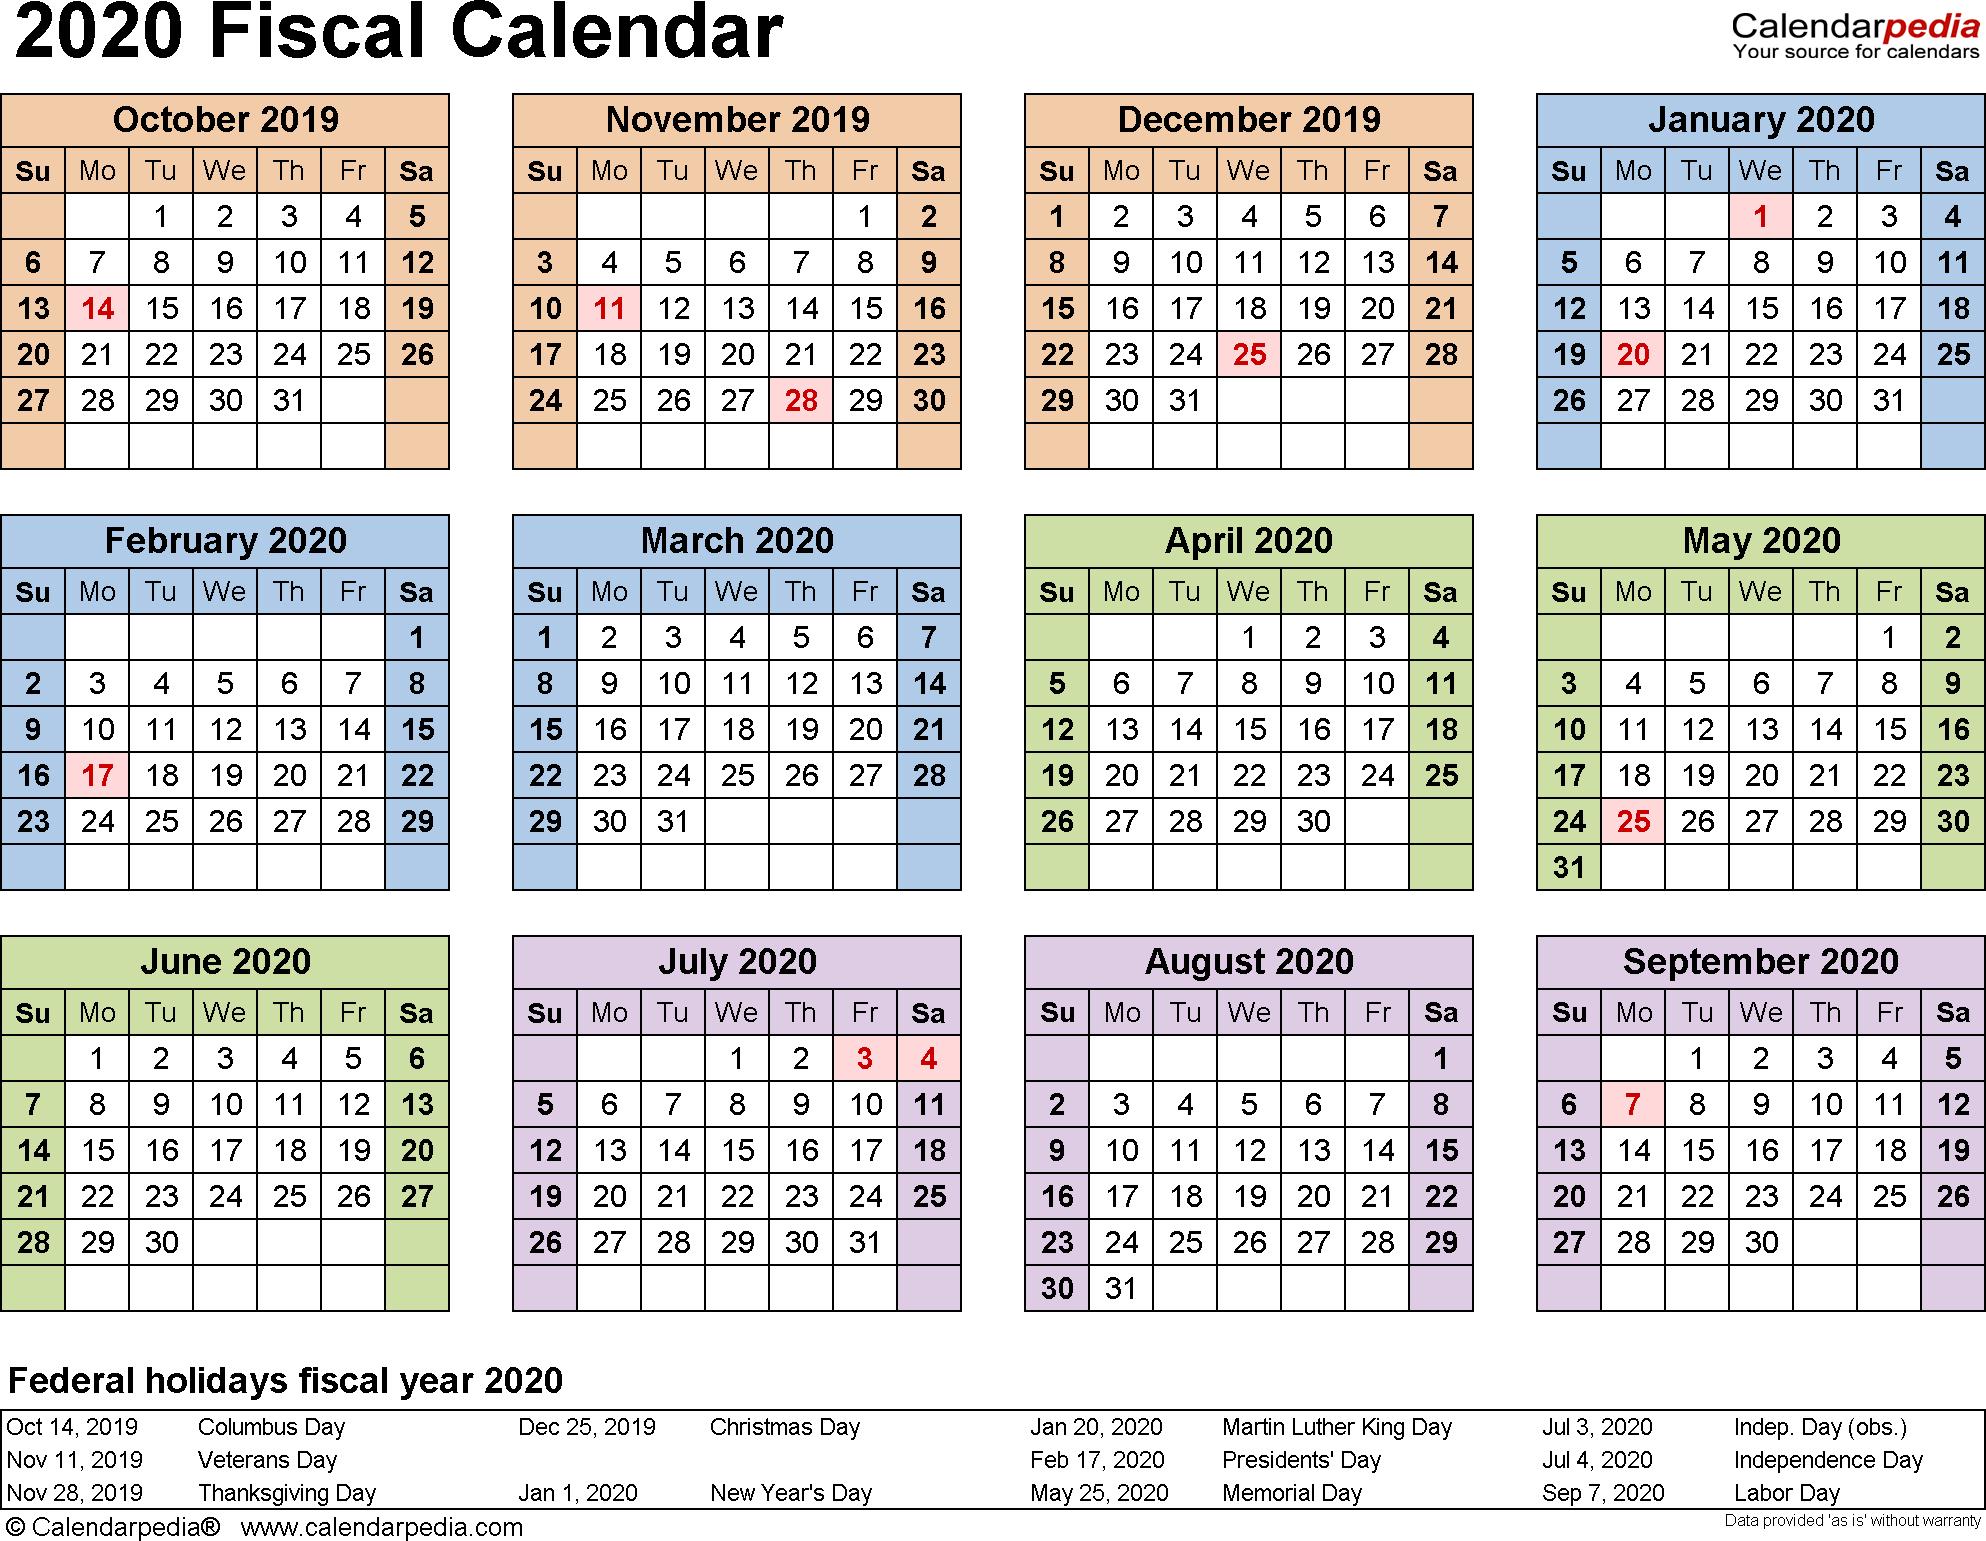 Fiscal Calendars 2020 As Free Printable Word Templates regarding 2020 Quarterly Calendar Printable Free